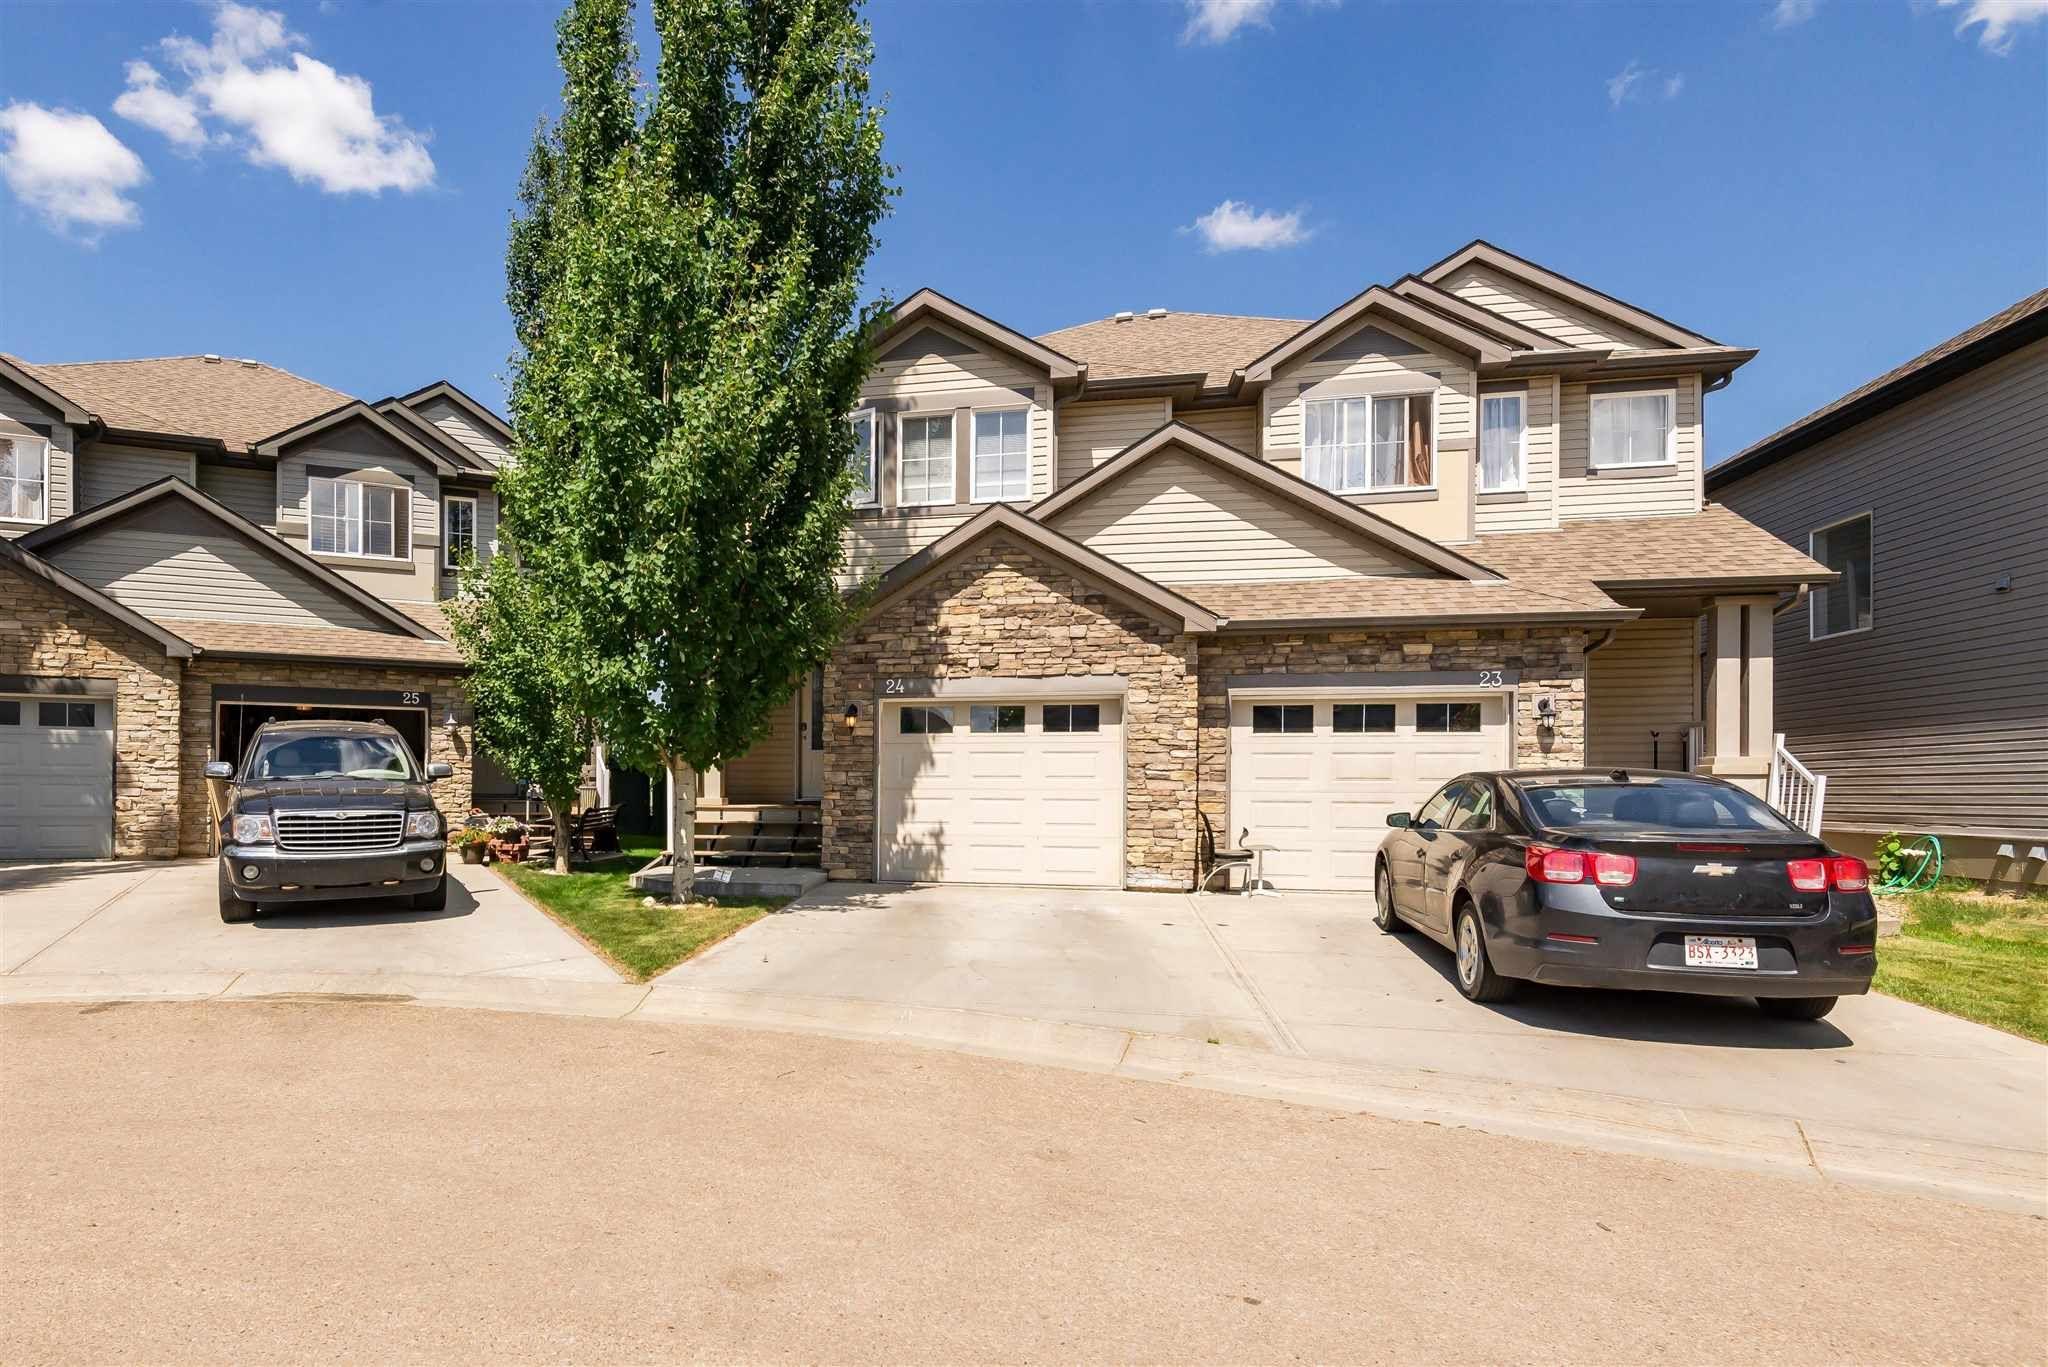 Main Photo: 24 9231 213 Street in Edmonton: Zone 58 House Half Duplex for sale : MLS®# E4251636